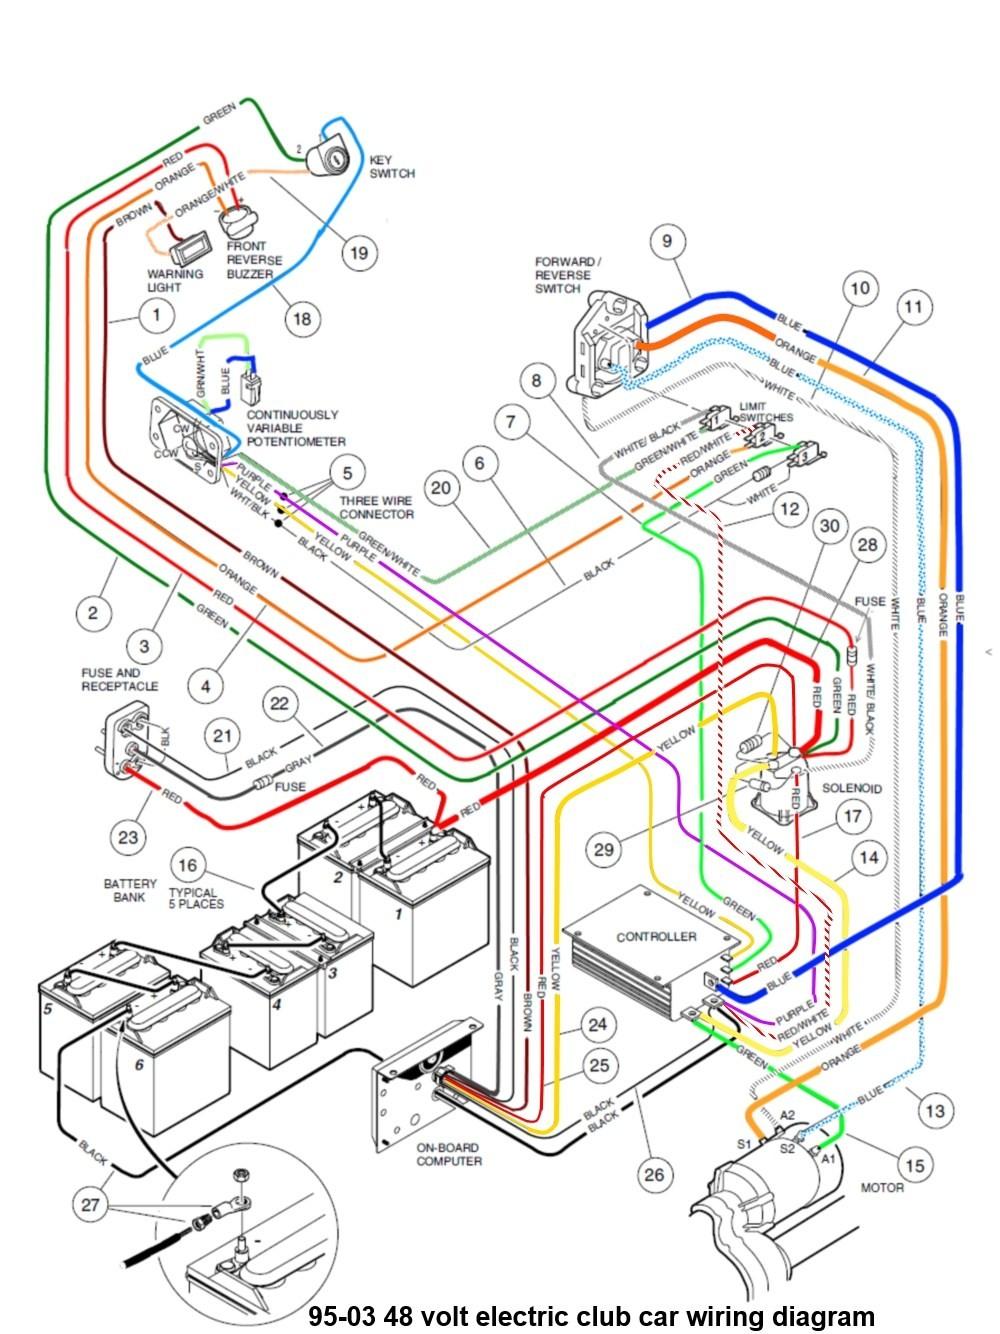 93 club car wiring diagram hd dump me 1995 club car ds gas wiring diagram 93